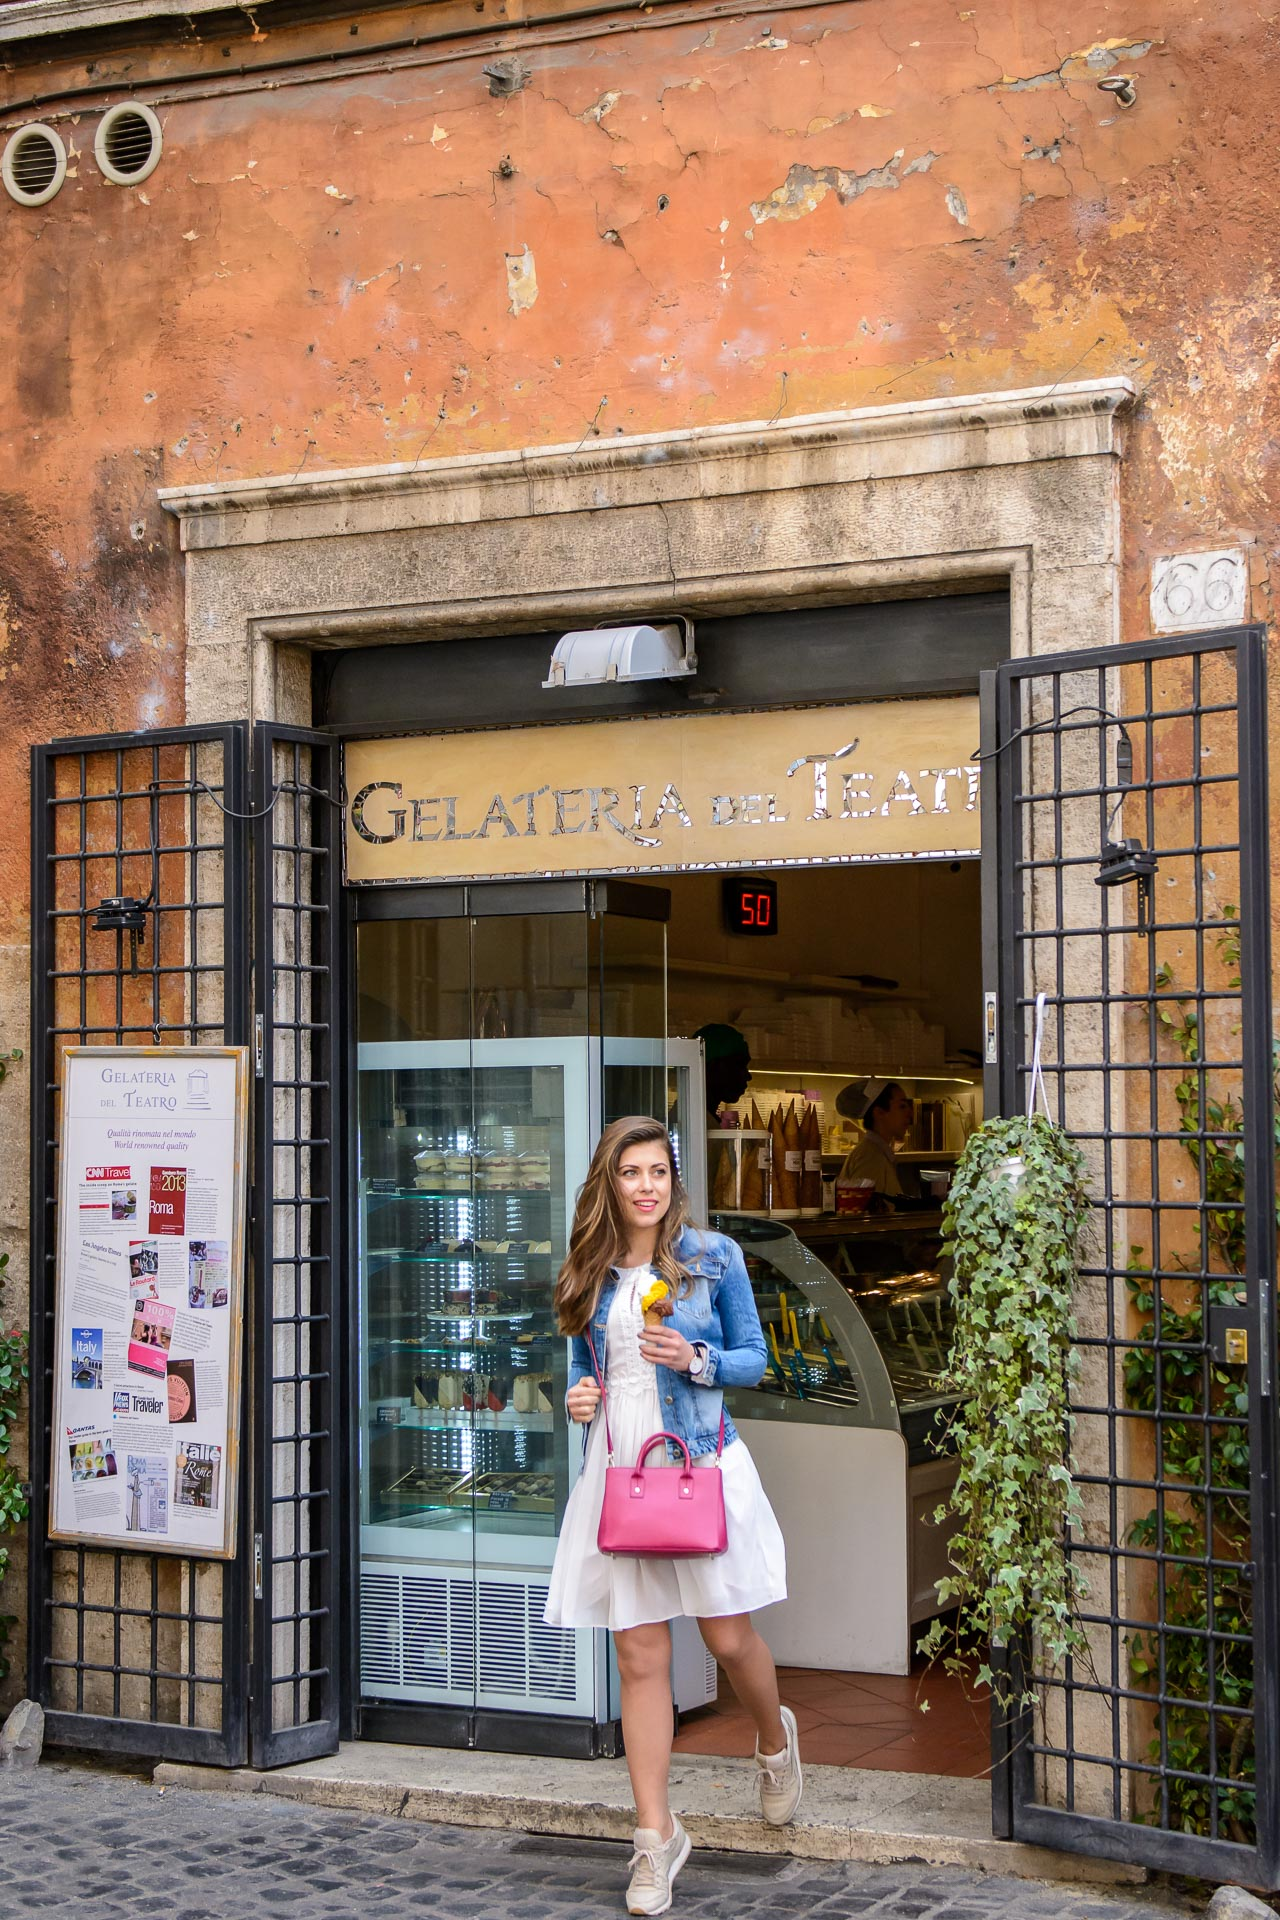 Rome blogger Gelateria del Teatro